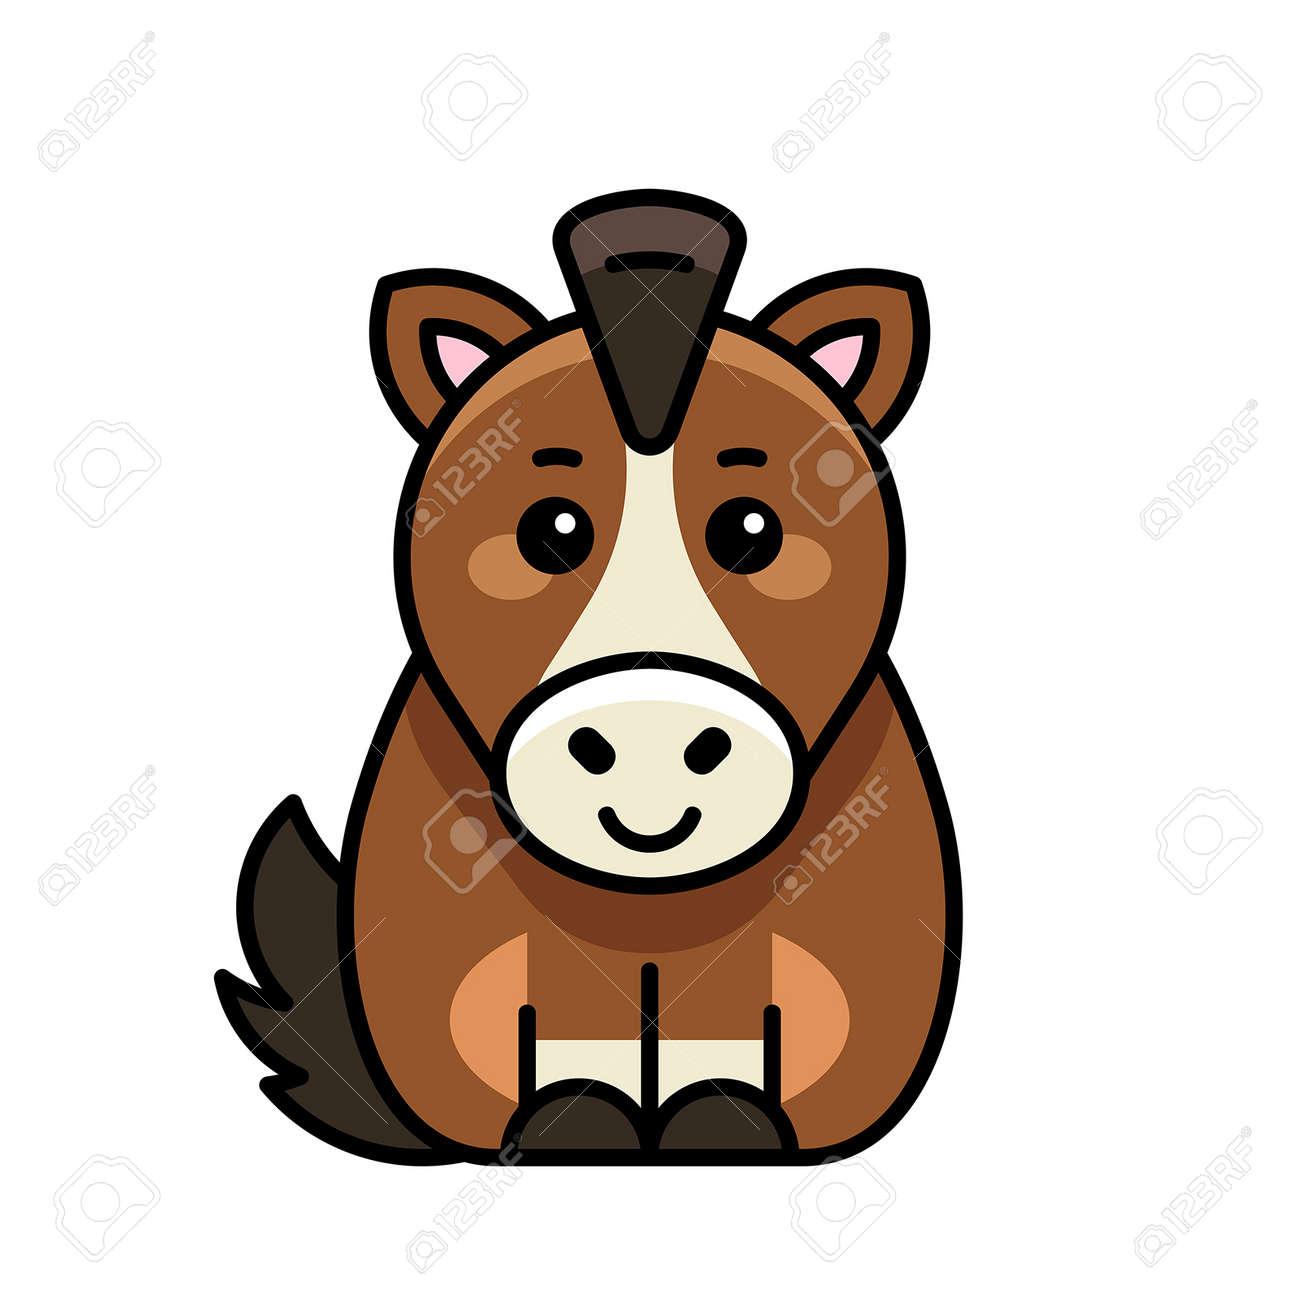 Horse icon. Icon design. Template elements - 171231685